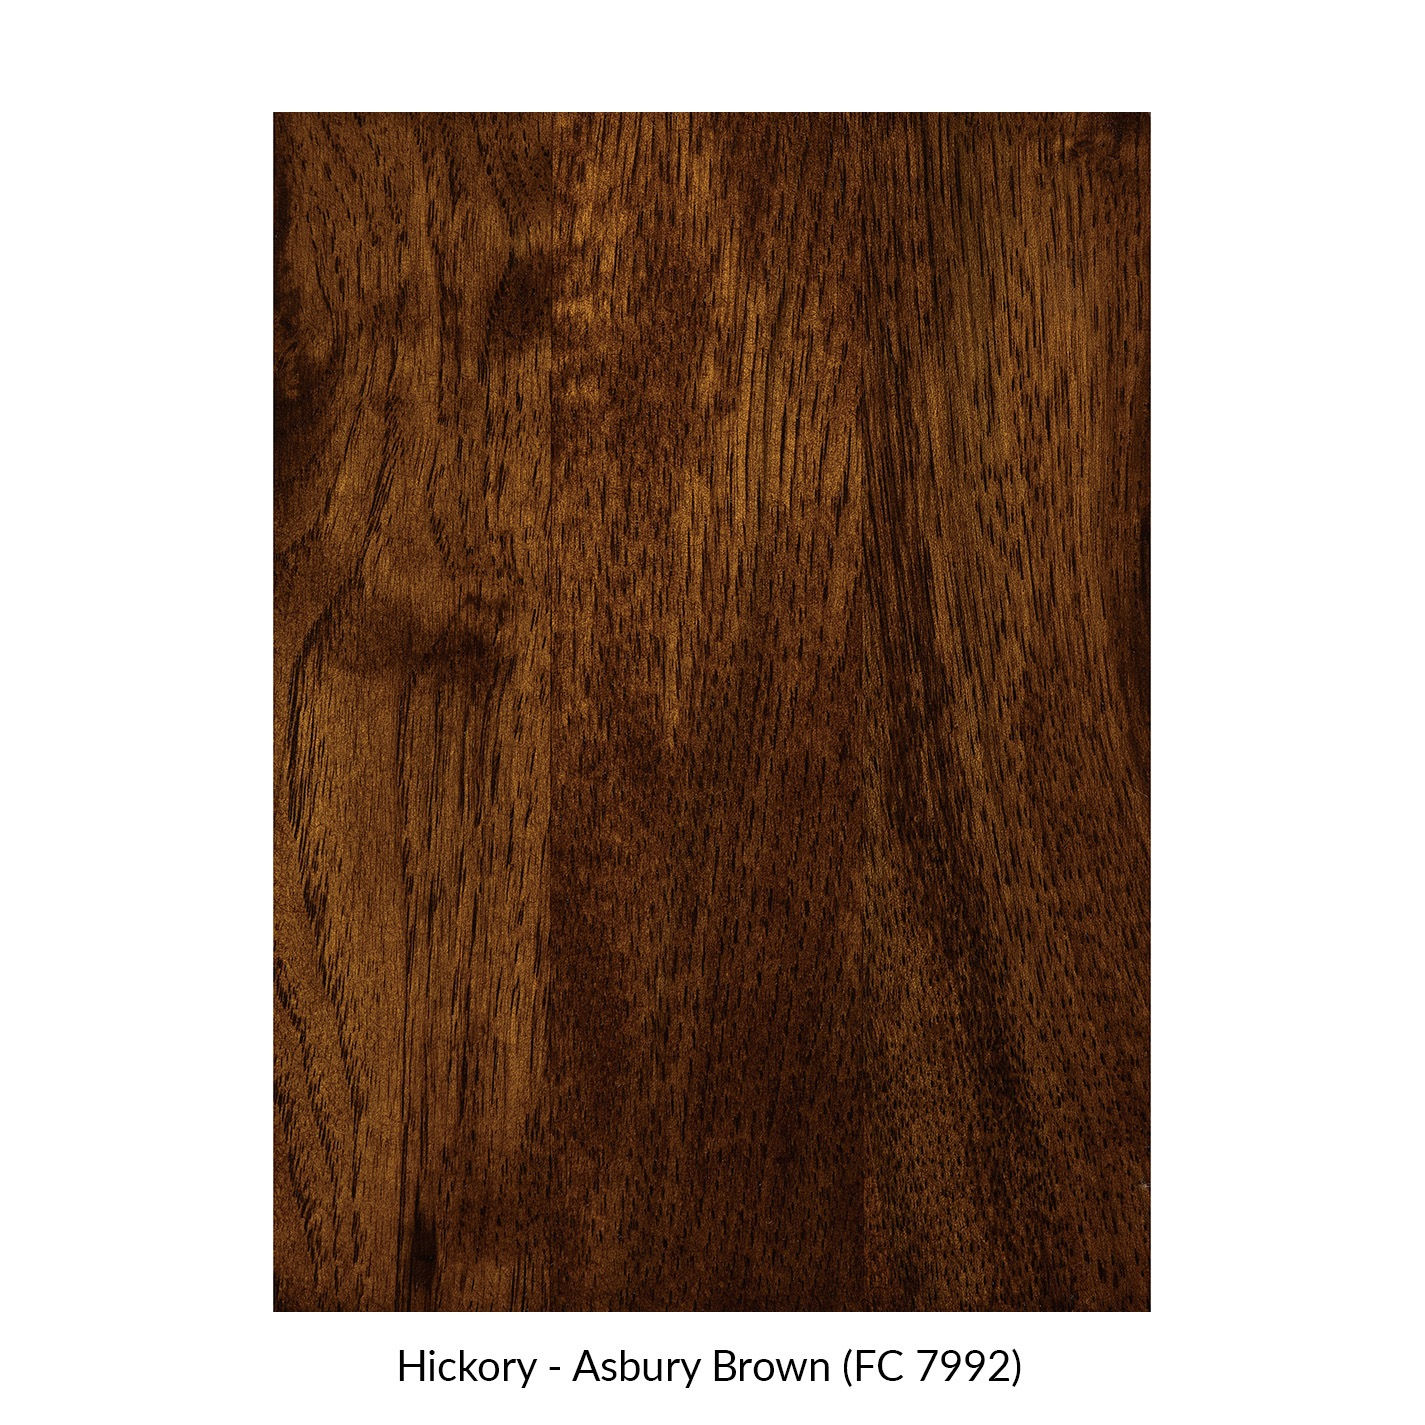 spectrum-hickory-asbury-brown-fc-7992.jpg